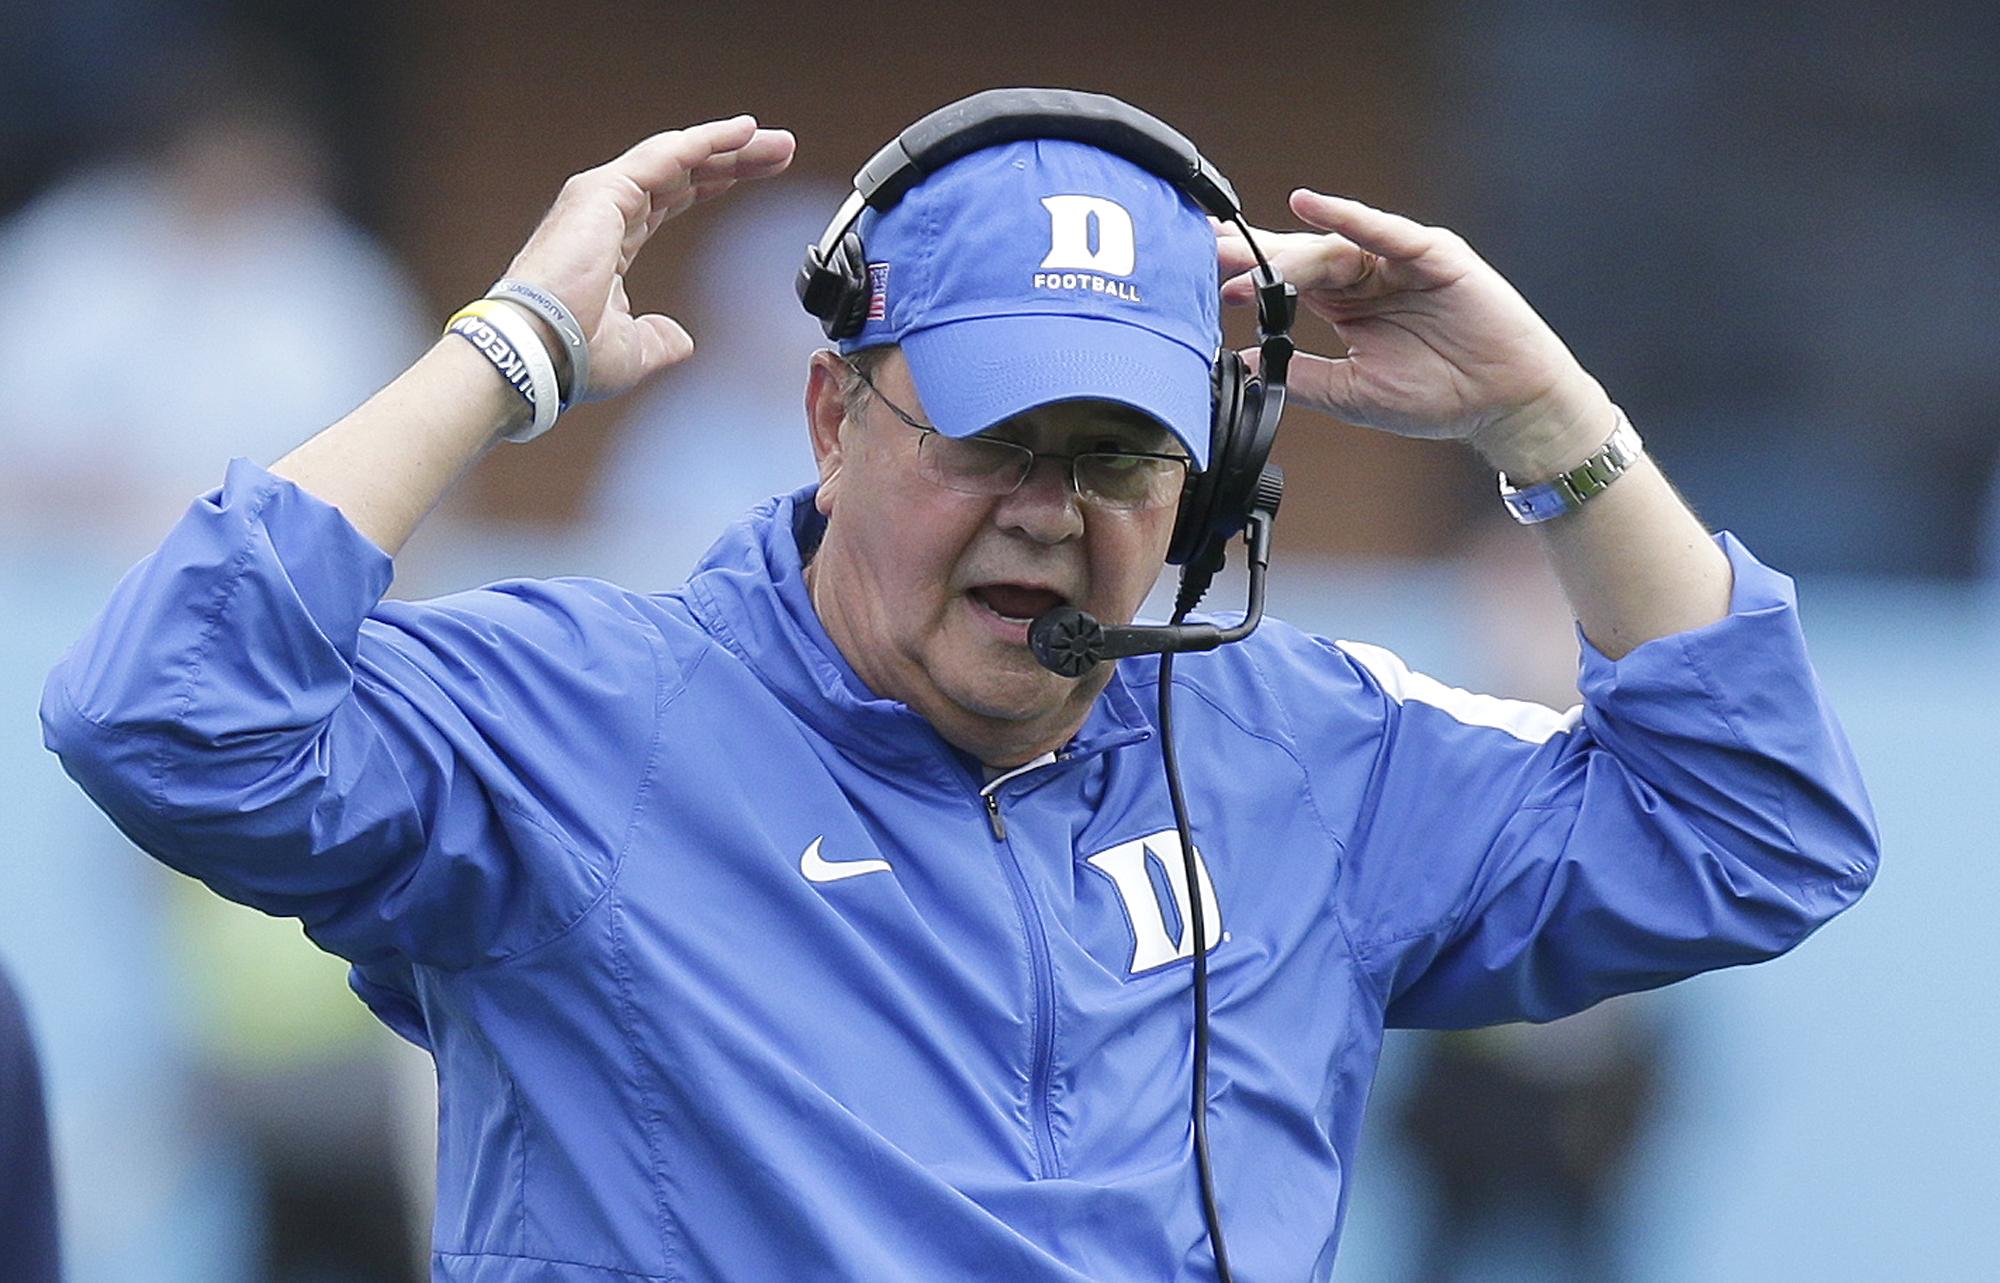 Duke coach David Cutcliffe reacts during the first half of an NCAA college football game against North Carolina in Chapel Hill, N.C., Saturday, Nov. 7, 2015. North Carolina won 66-31. (AP Photo/Gerry Broome)